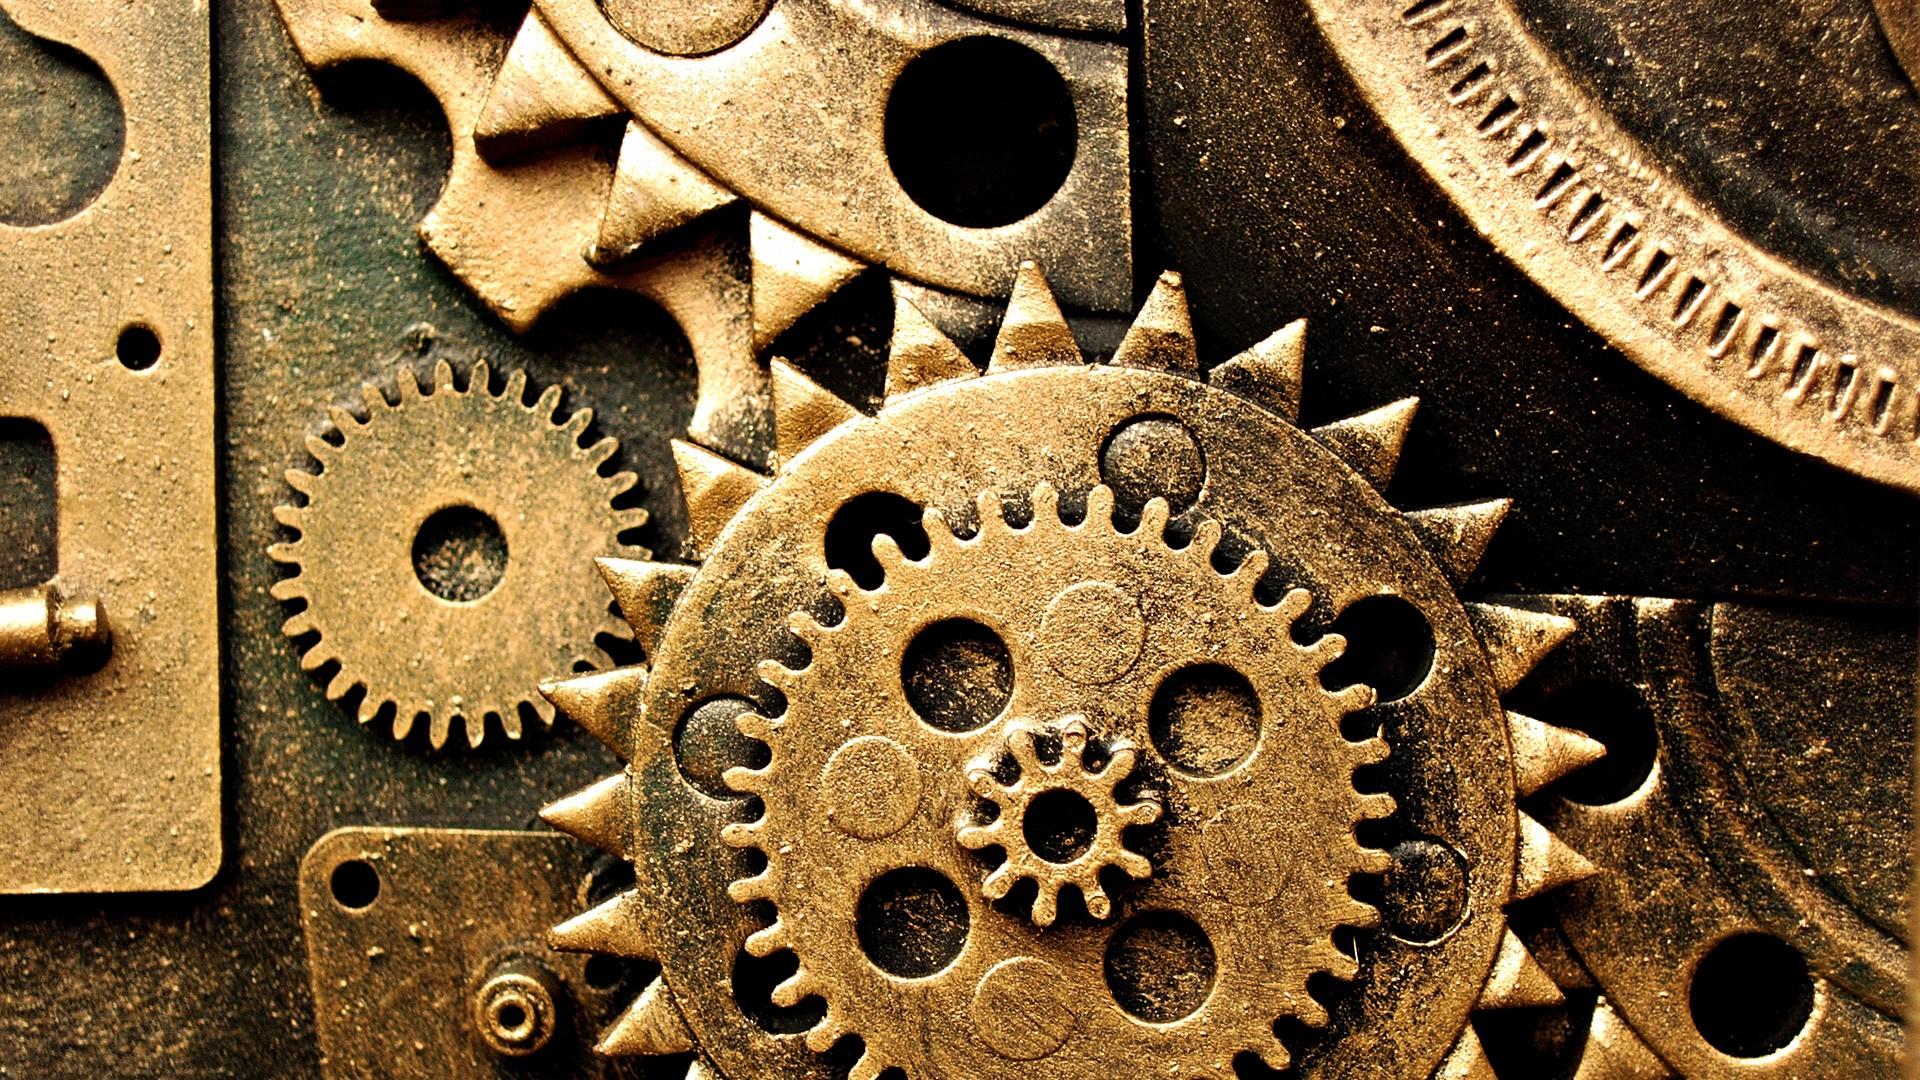 machine hd wallpaper background image 1920x1080 id 266461